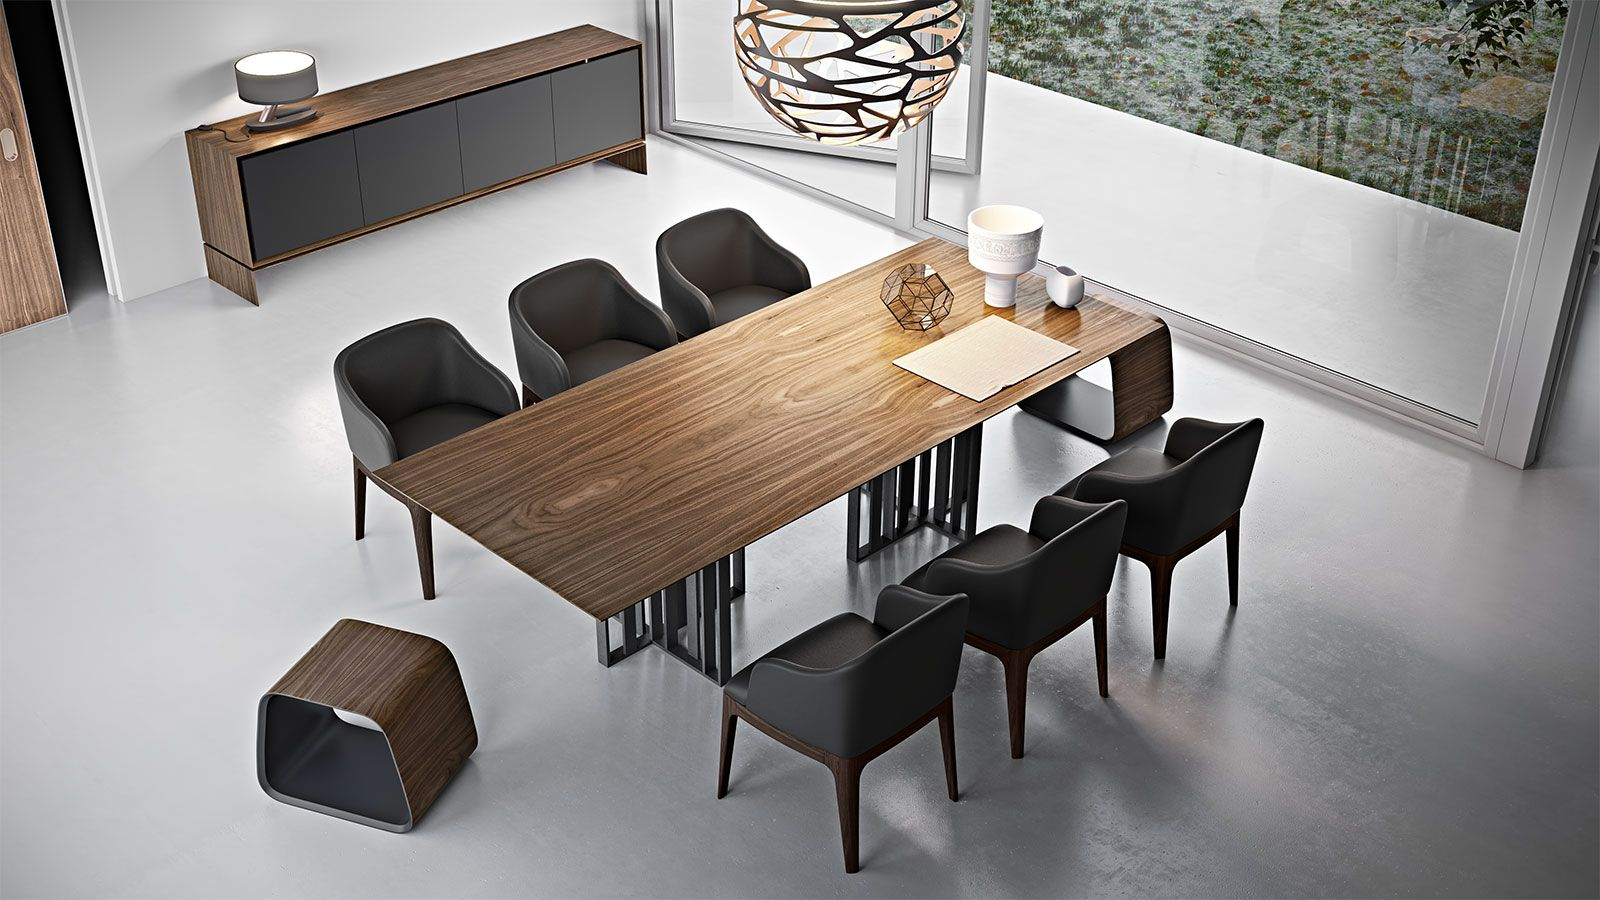 Modloft Spitalfields 106in Dining Table Mej10021 Official Store